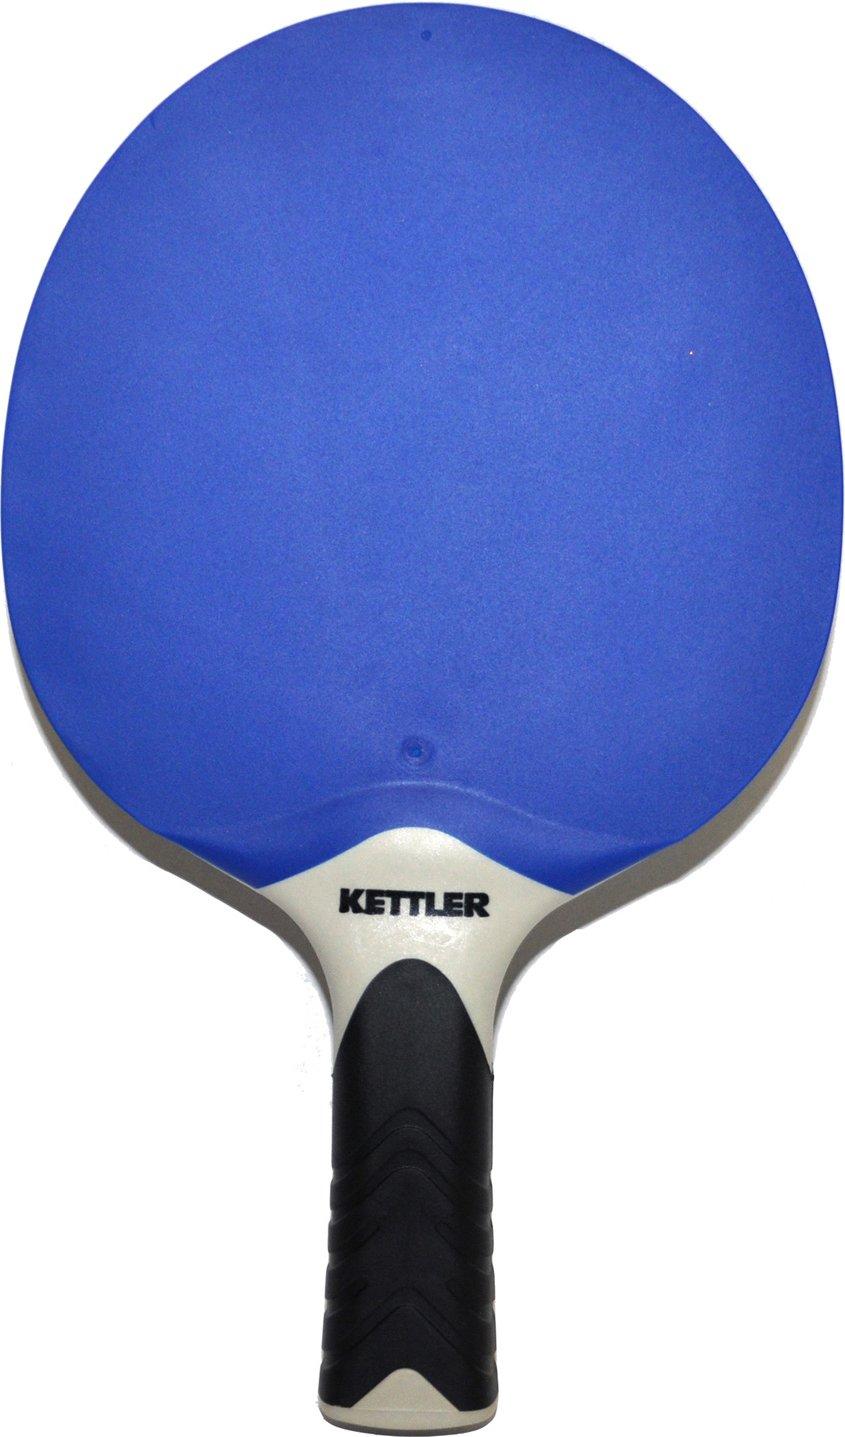 Amazon.com : Kettler HALO 5.0 Indoor/Outdoor Table Tennis Bundle: 2 ...